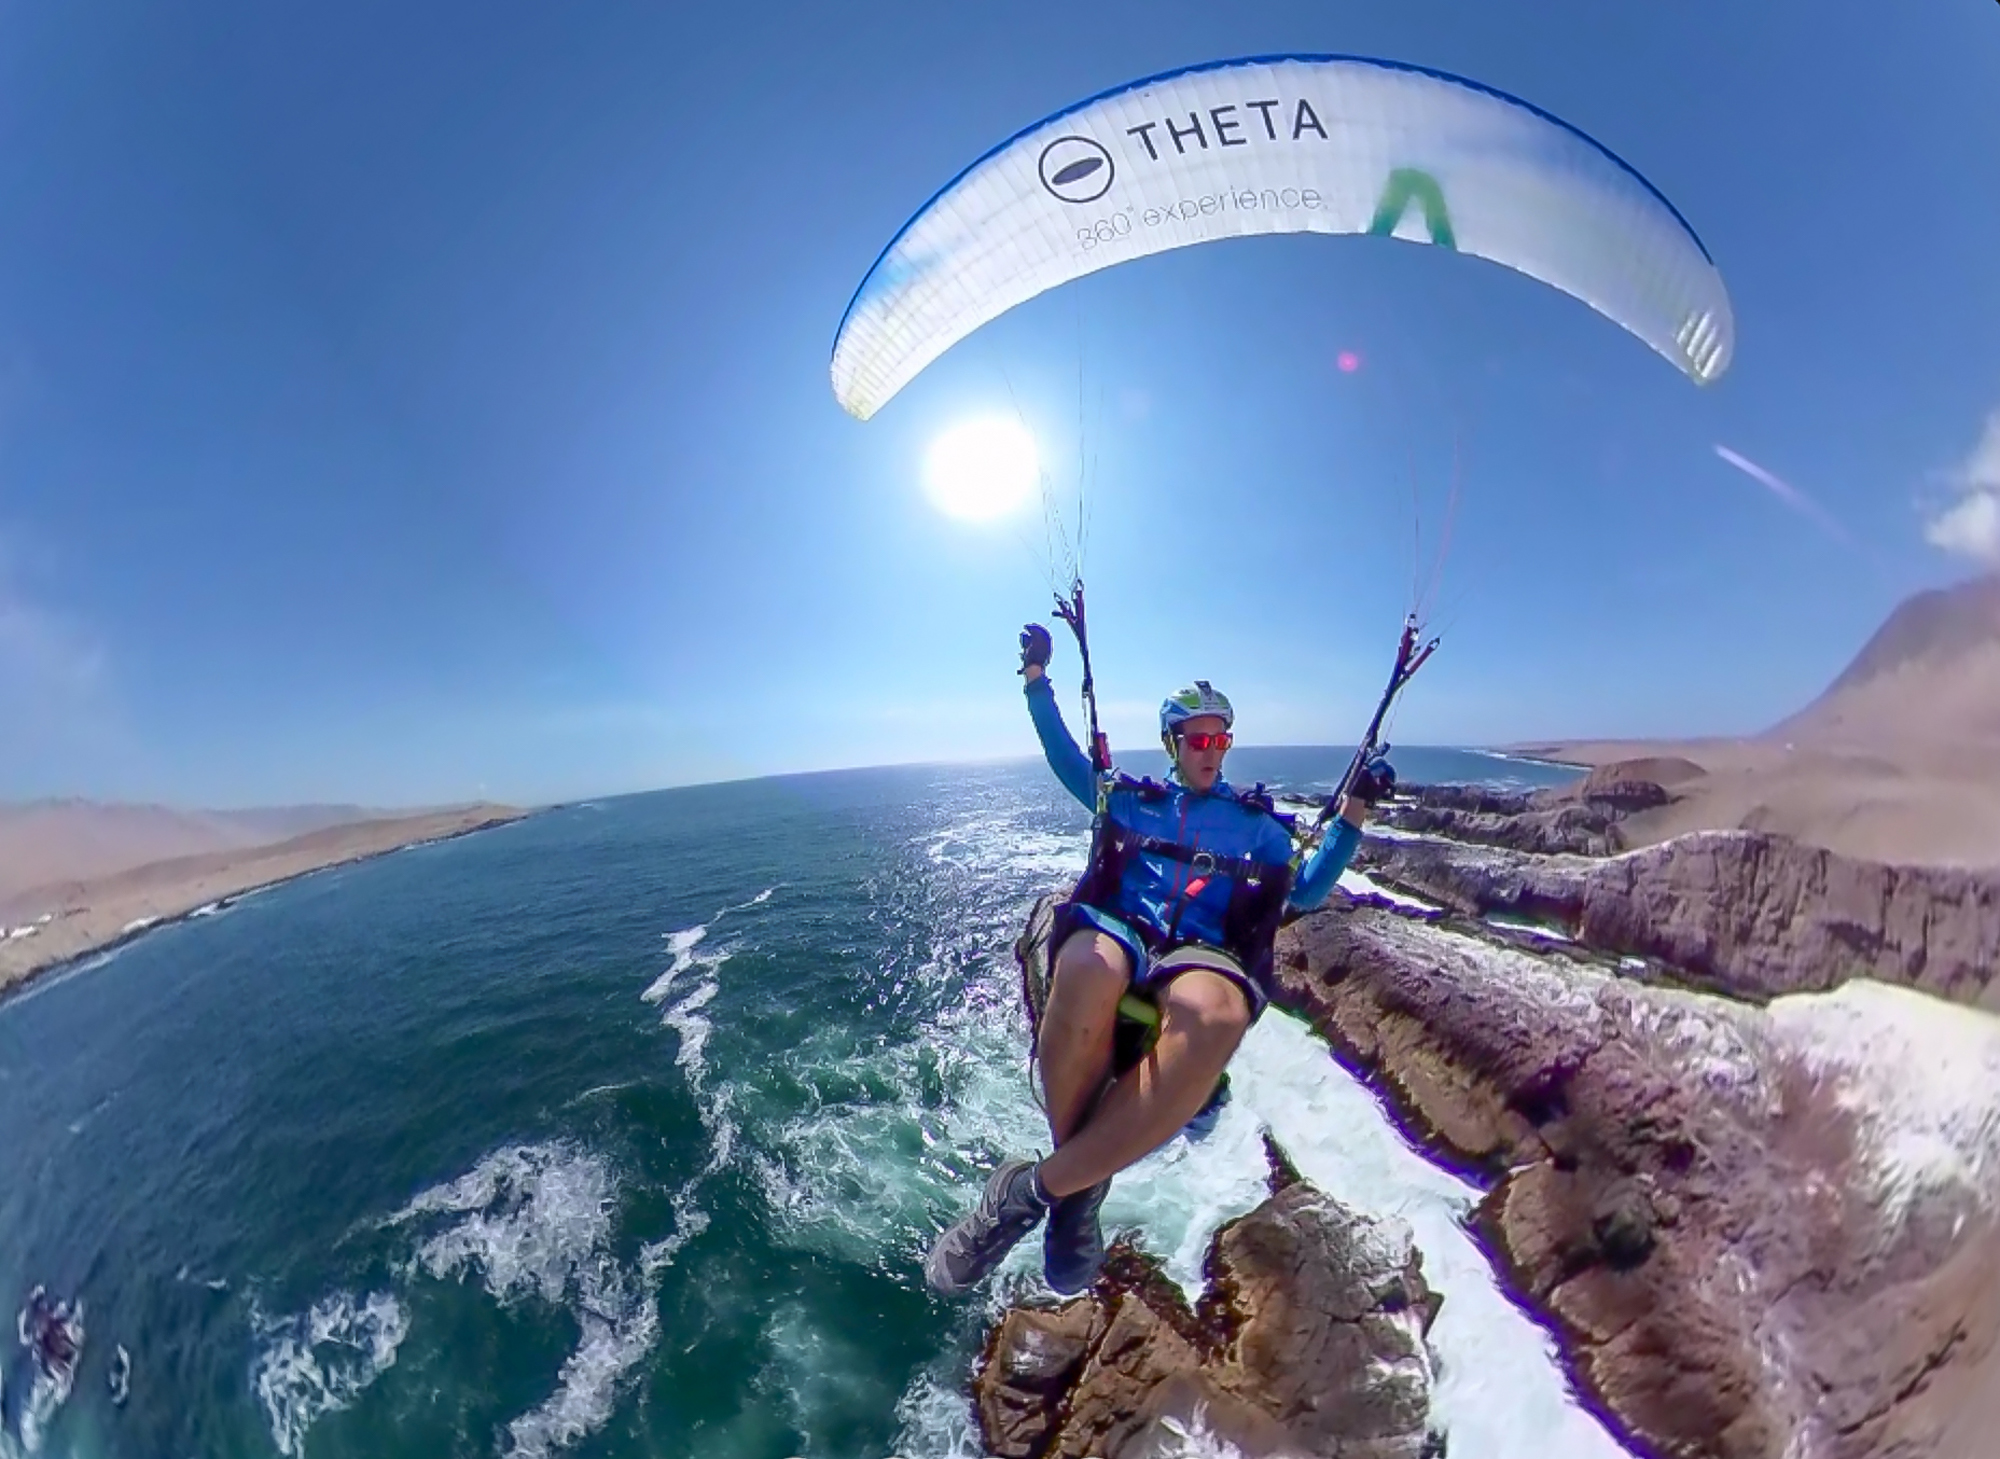 Chile Paragliding Francois ragolski Theta V Ricoh Skywalk Syride supair-6